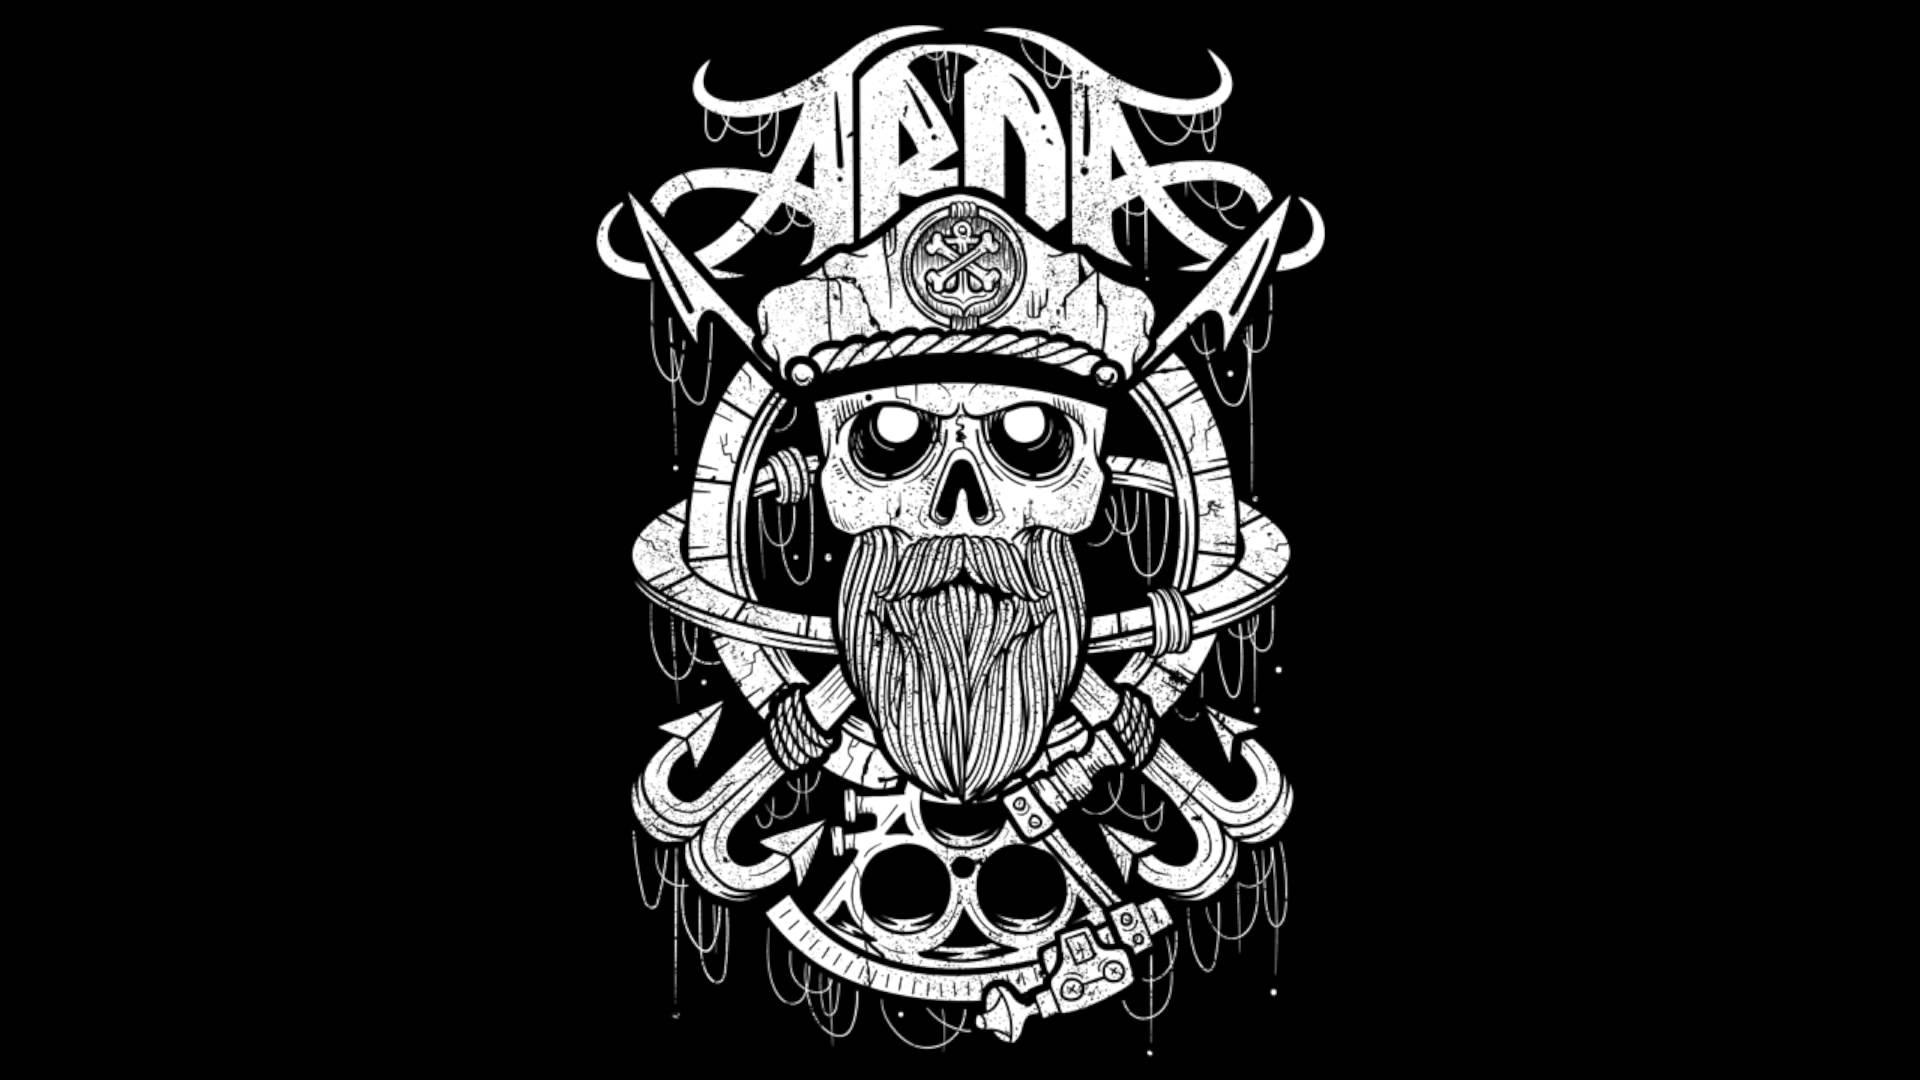 ARDA - Мёртвая вода (2015)